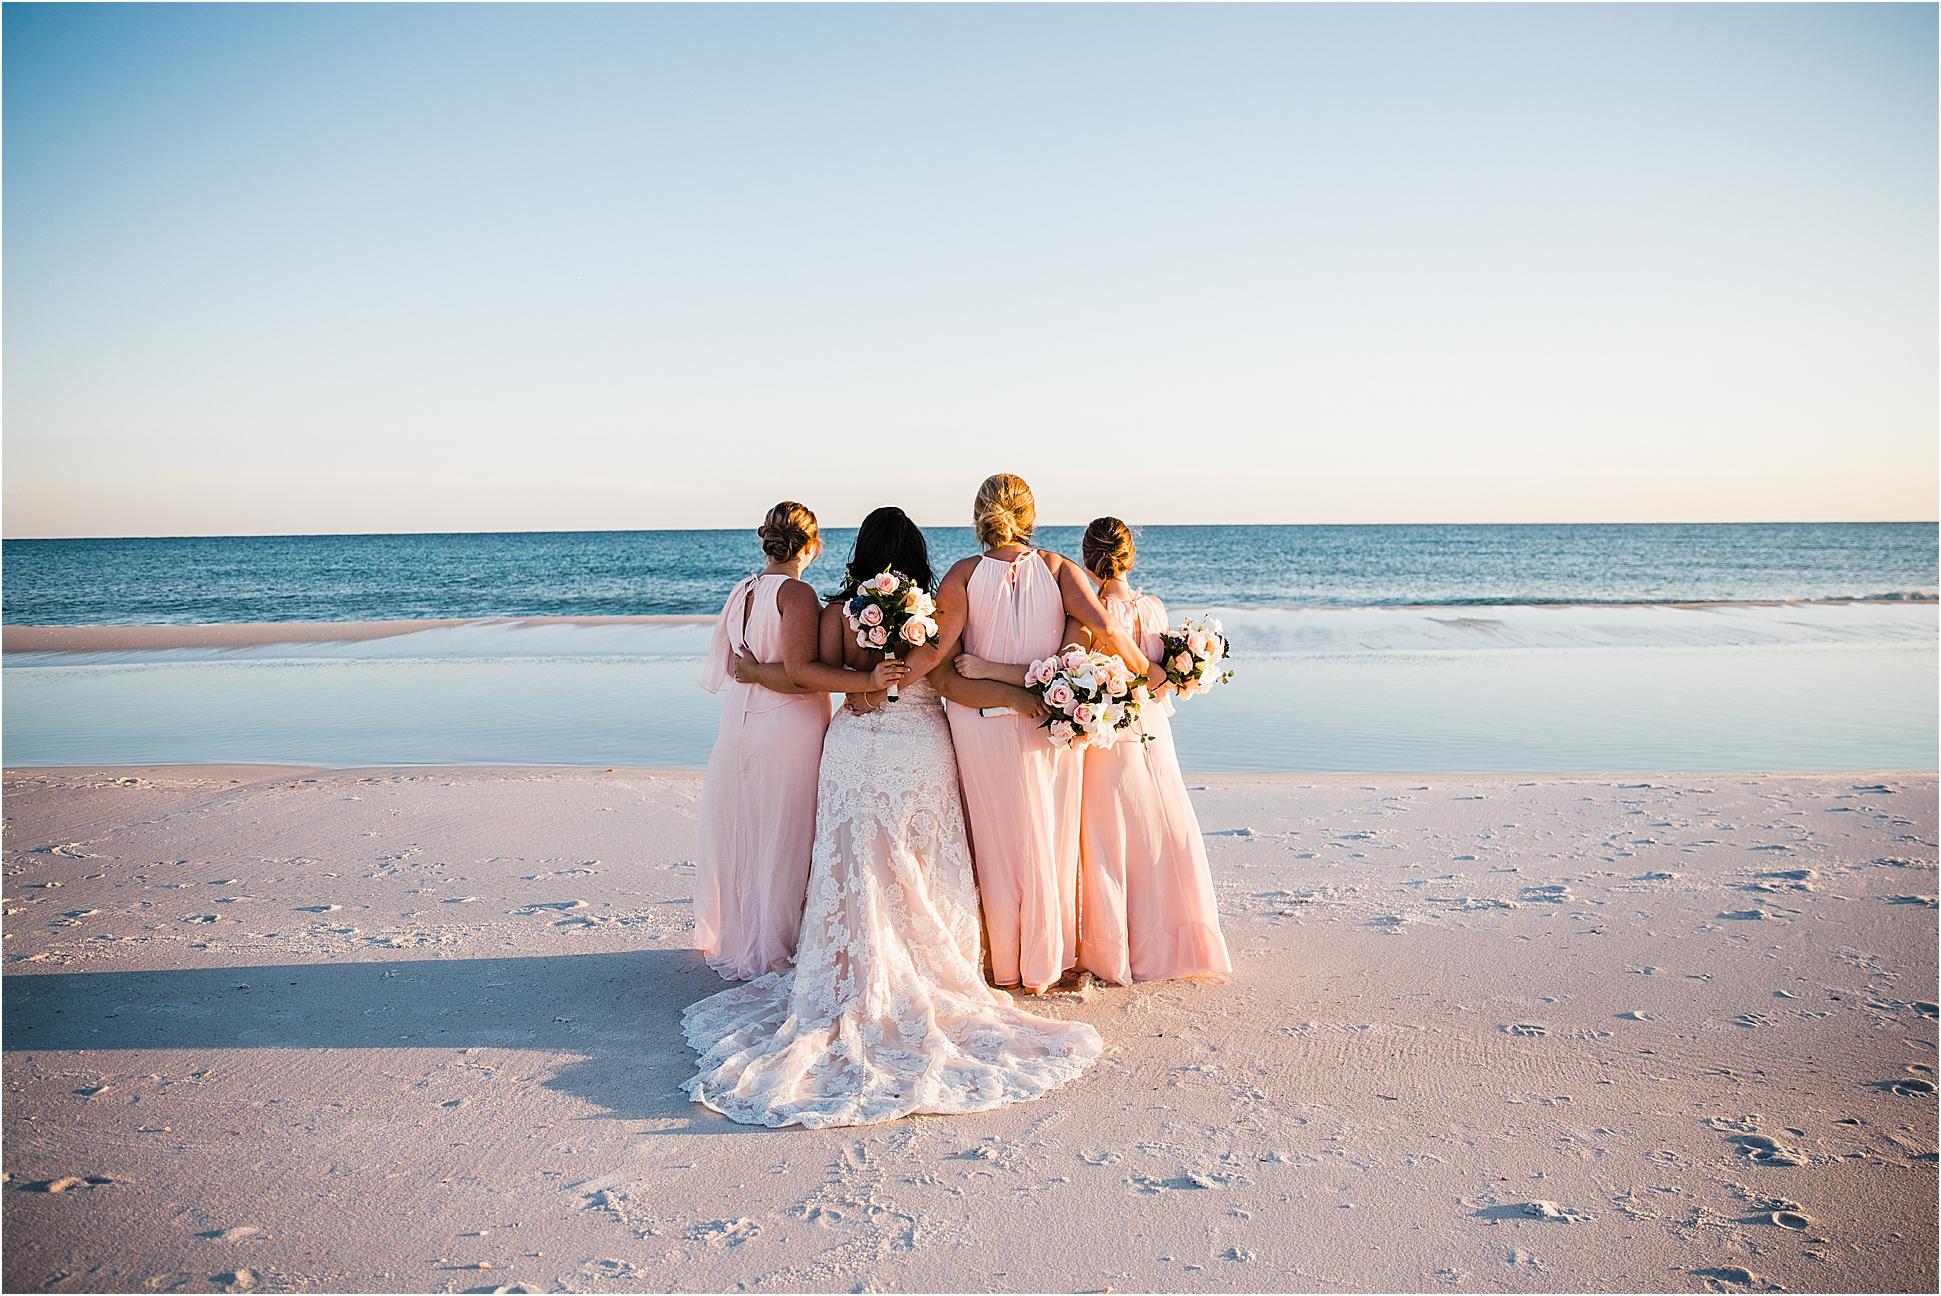 Bridesmaids Pictures Ideas